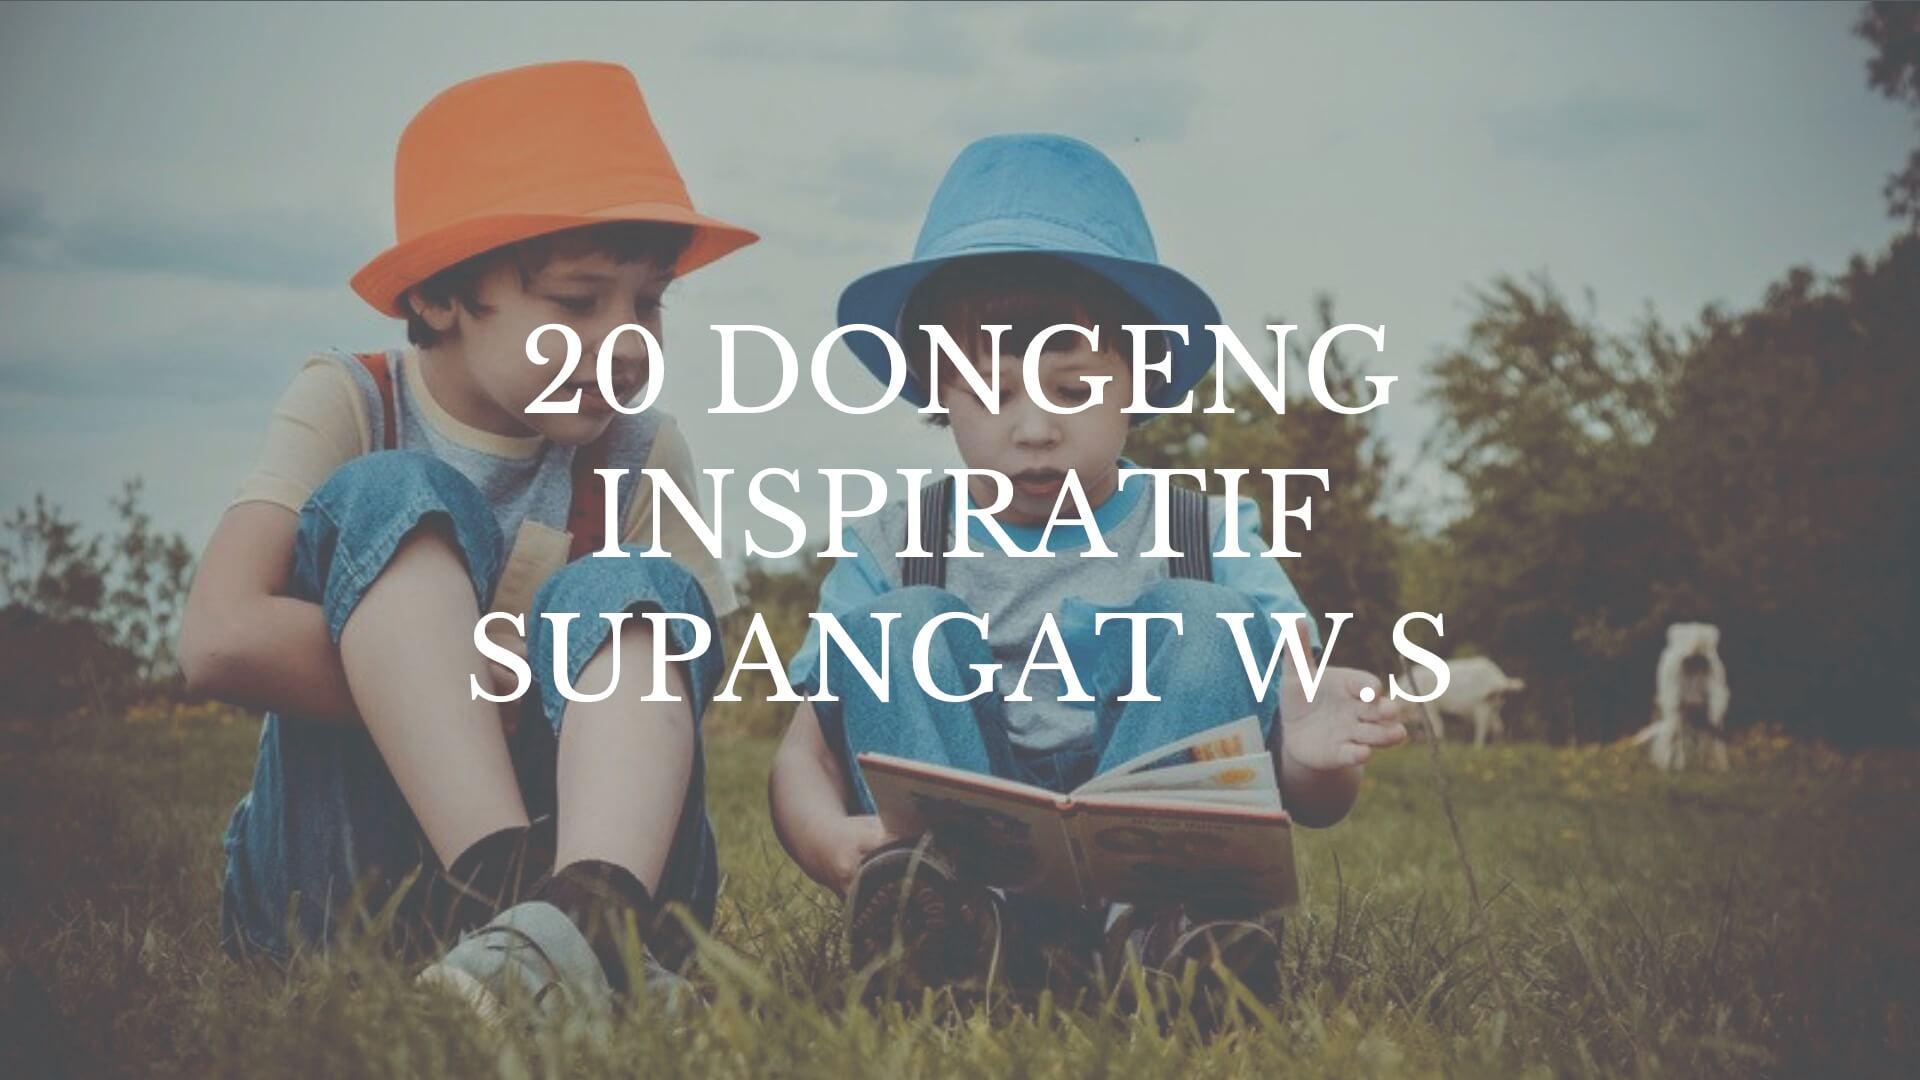 20 Dongeng Inspiratif Supangat W.S